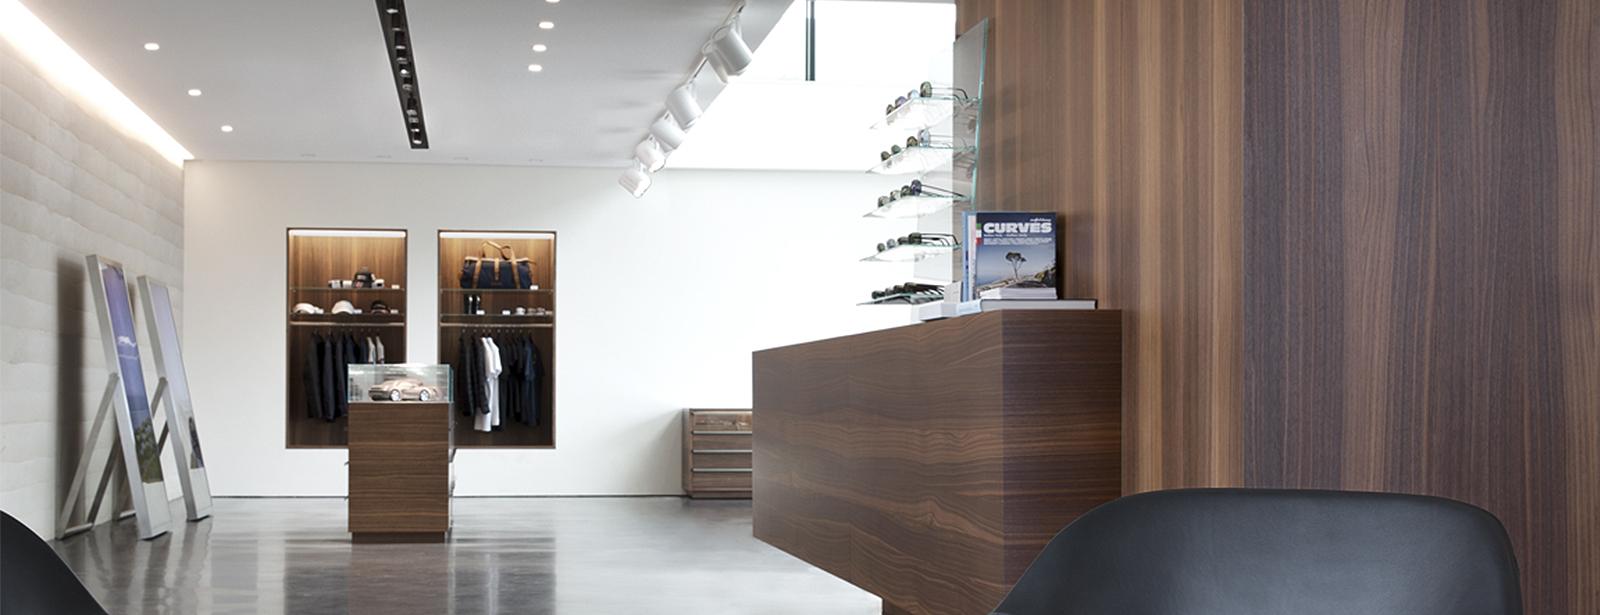 porsche auf sylt porsche design driver s selection. Black Bedroom Furniture Sets. Home Design Ideas